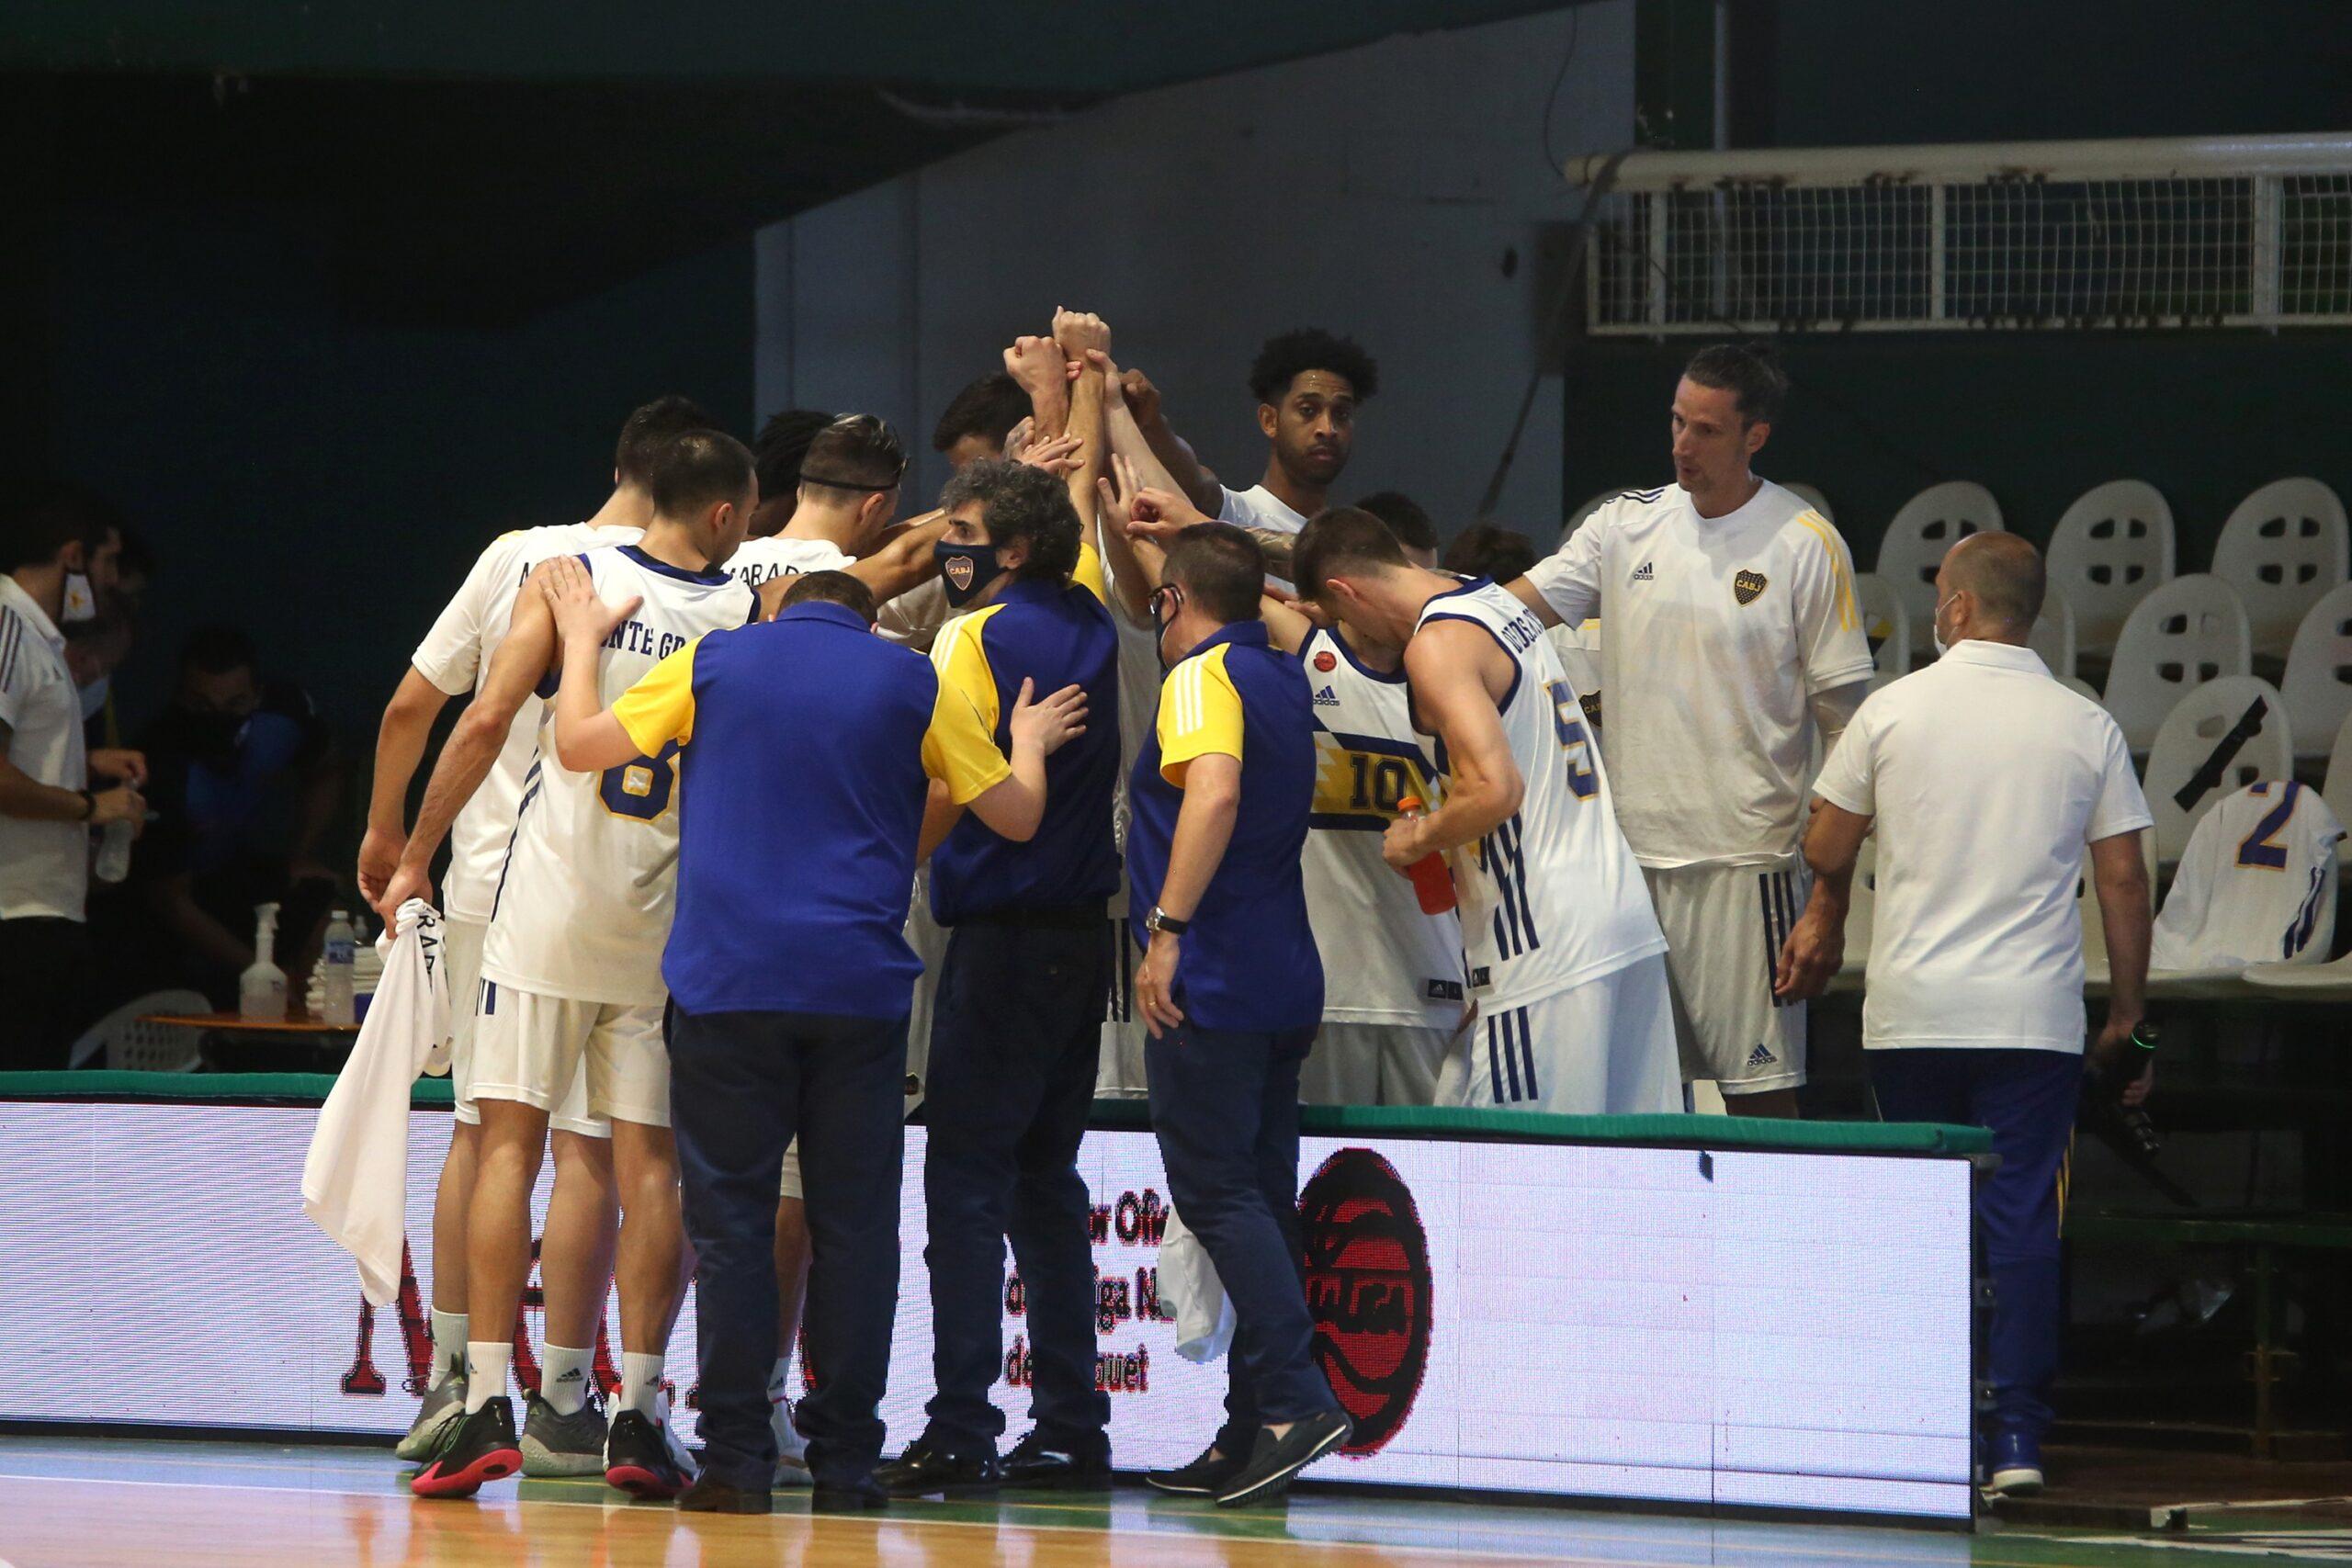 boca basquet liga nacional, sin chances en el final four